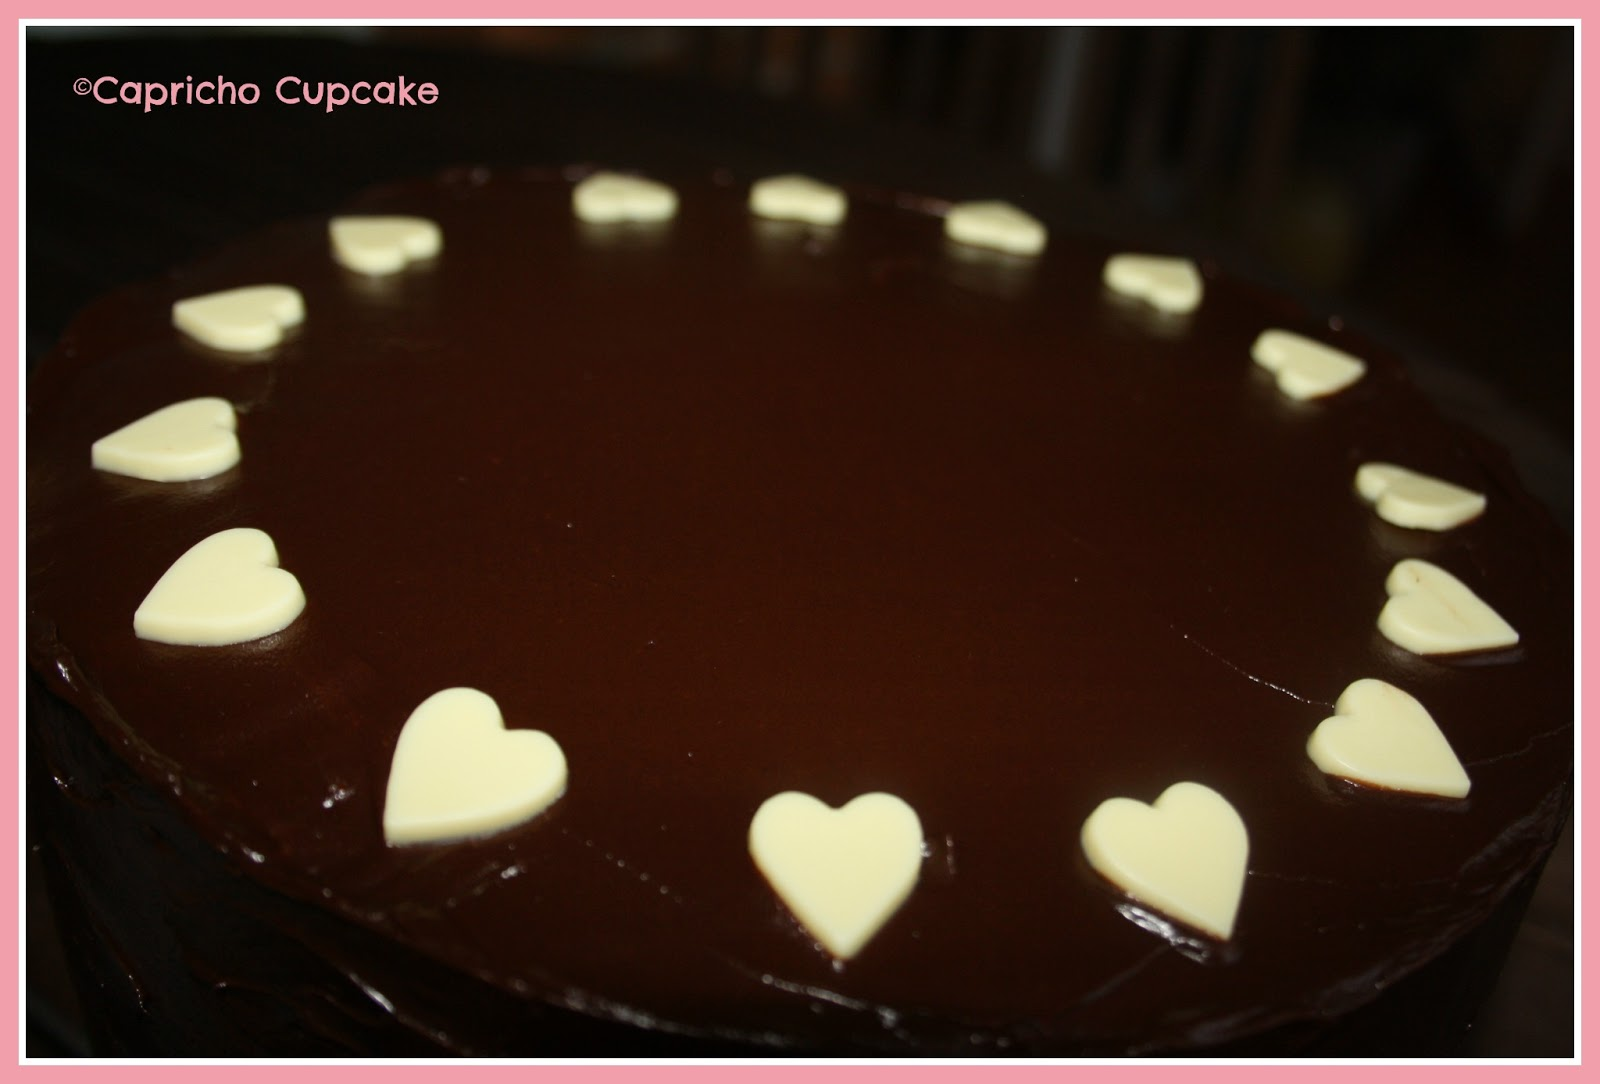 layer cake chocolates y ganache capricho cupcake